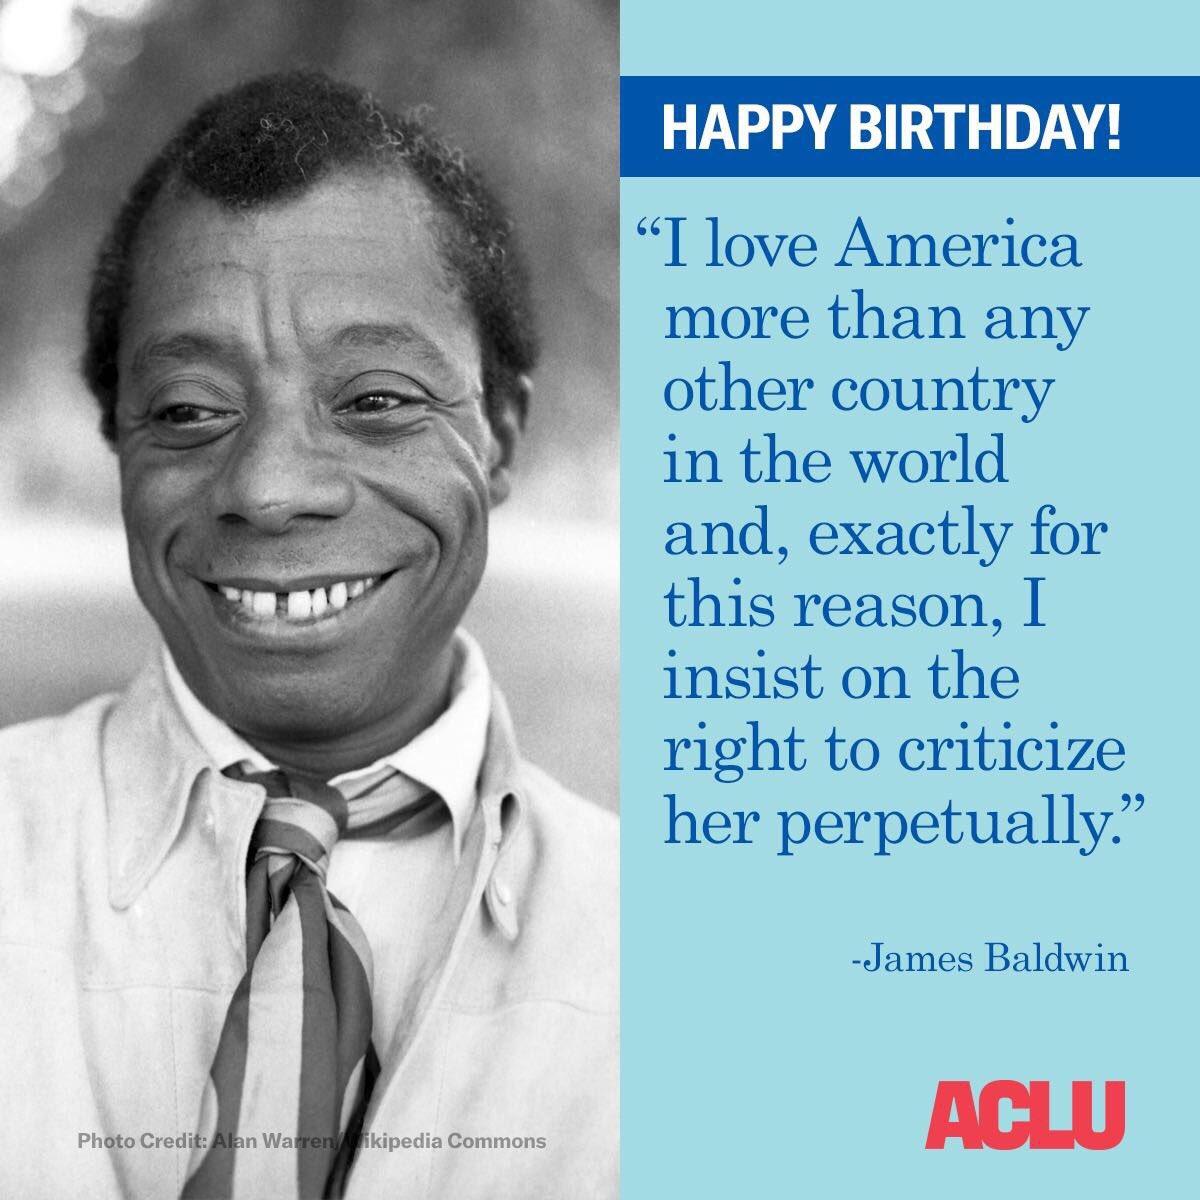 Happy birthday, James Baldwin!